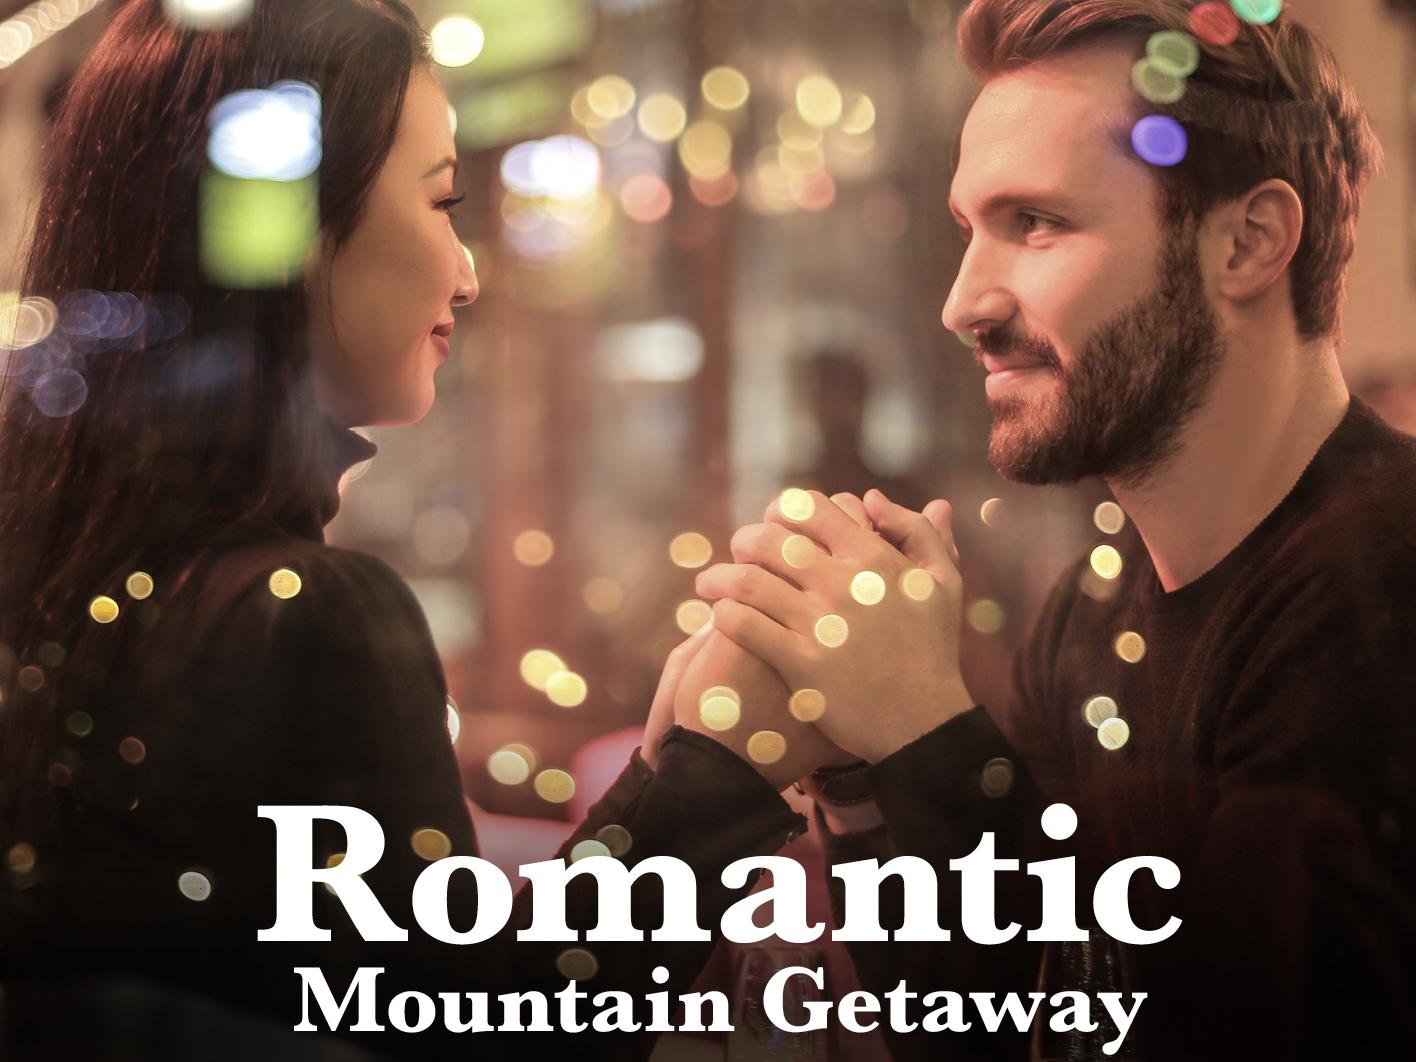 Romantic Mountain Getaway